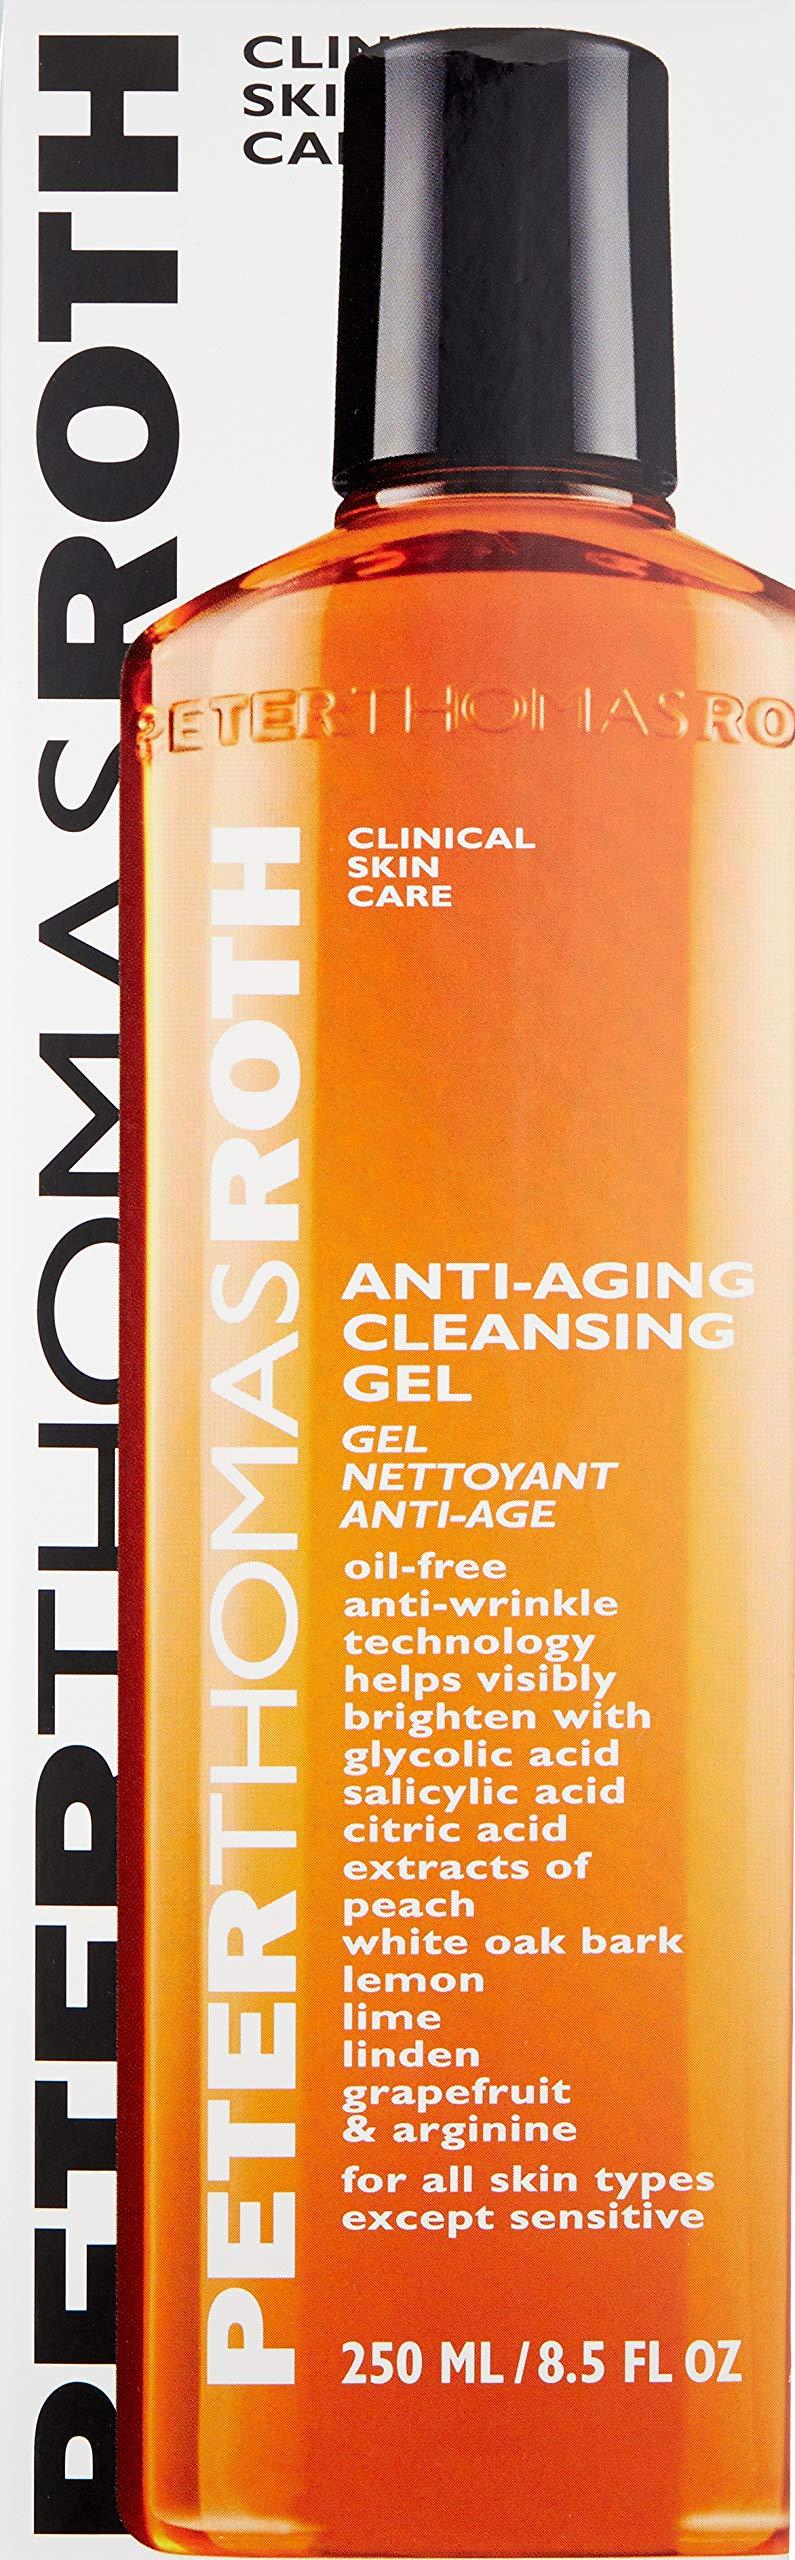 Peter Thomas Roth Anti-aging Cleansing Gel, 8.5 fl. oz. by Peter Thomas Roth (Image #3)